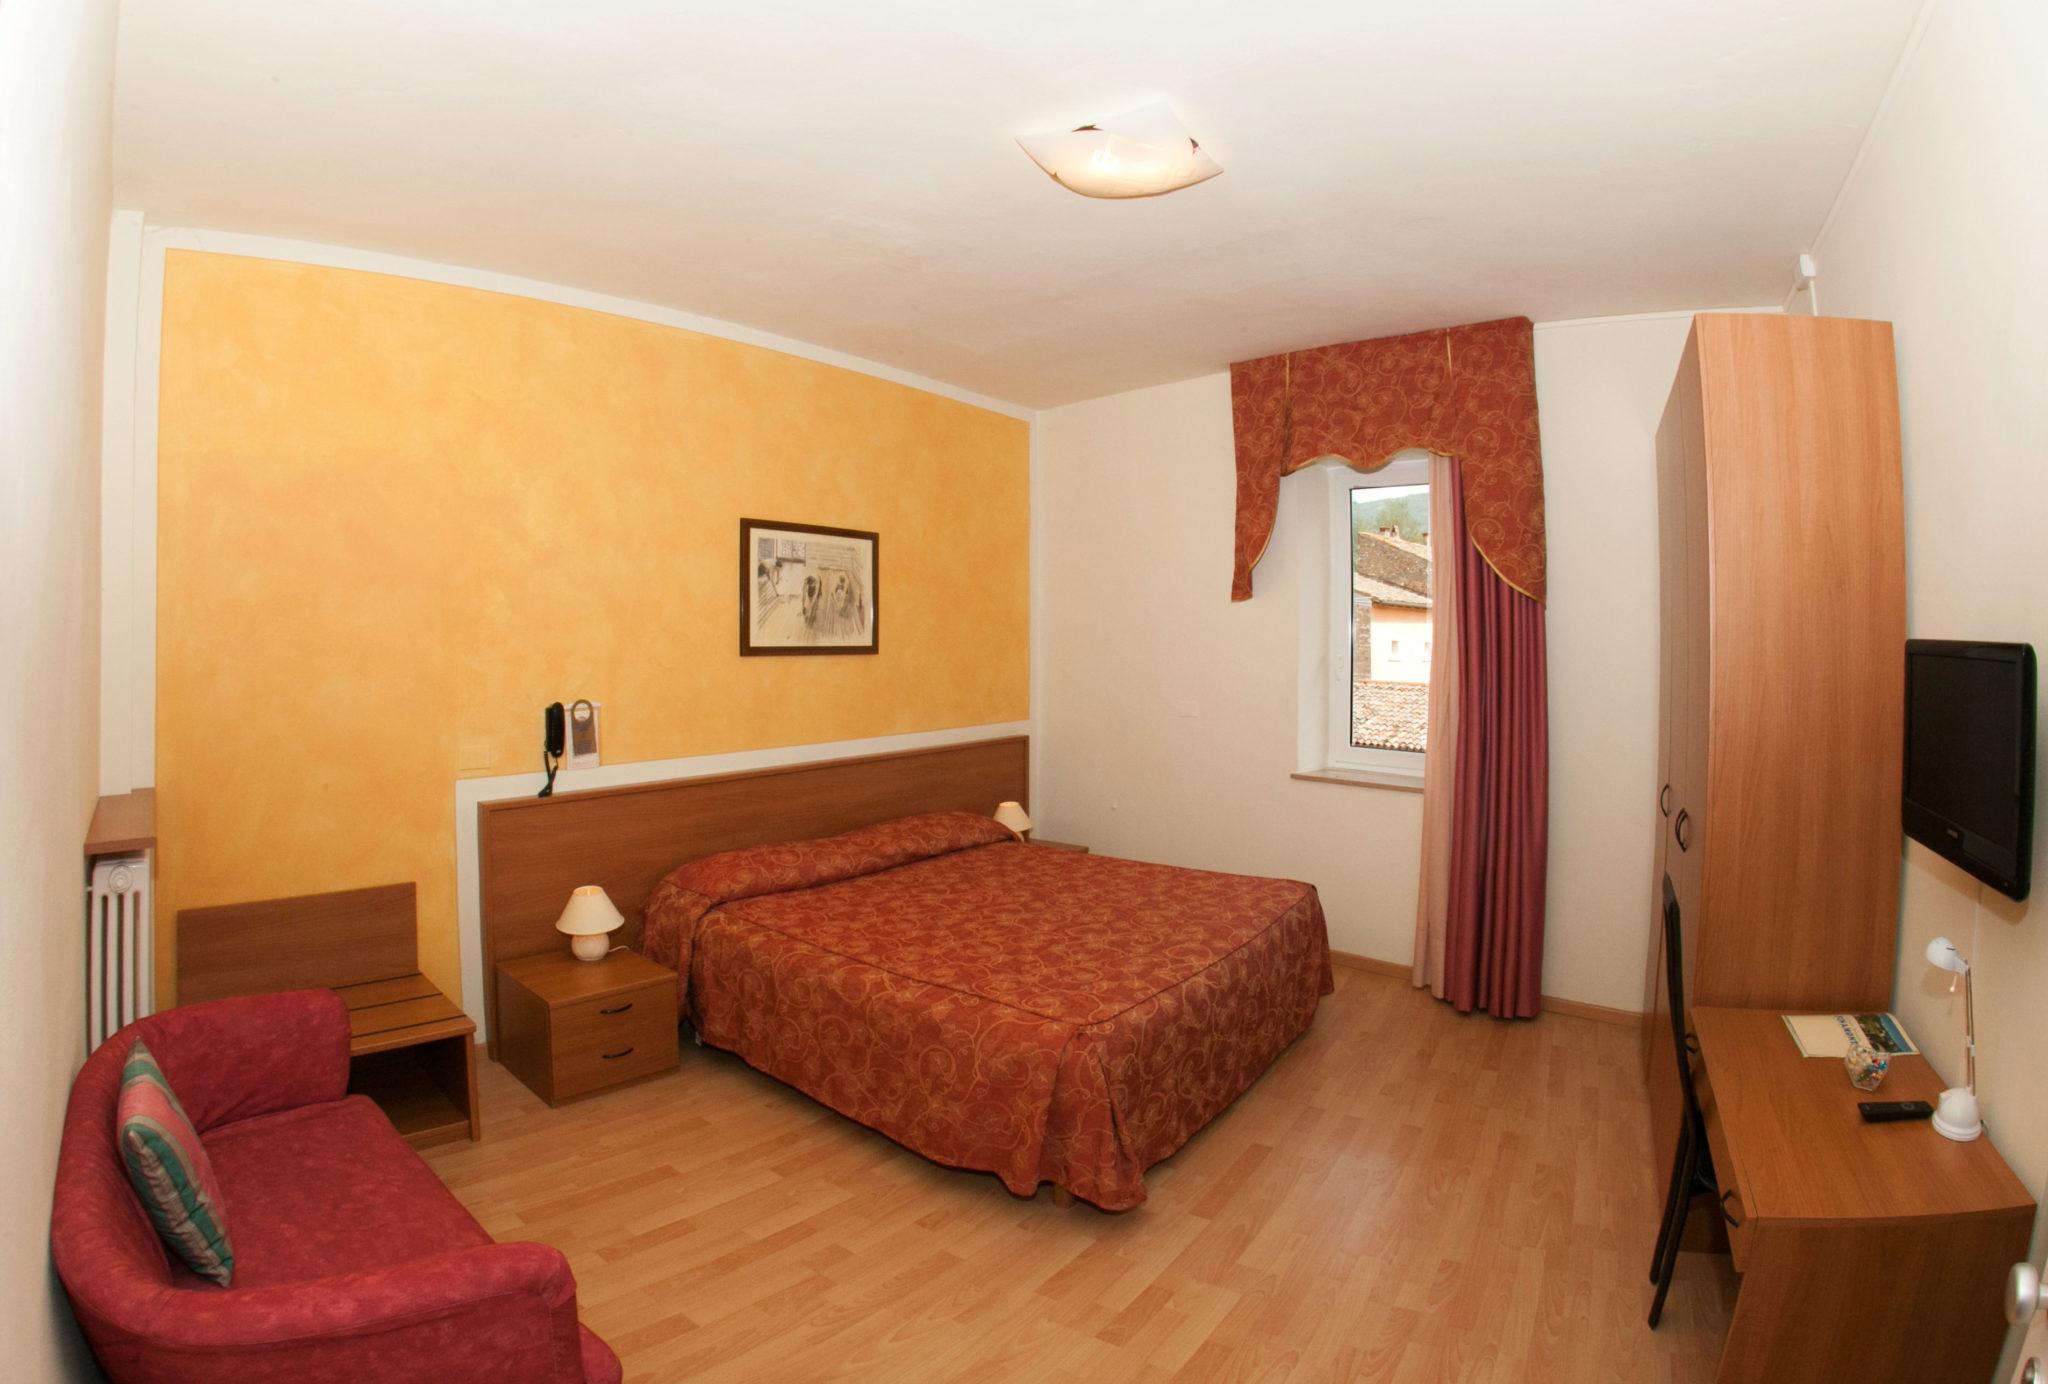 Doppelzimmer, Hotel*** Pinamonte, Costermano sul Garda, Lago di Garda, Gardasee, Verona, Veneto